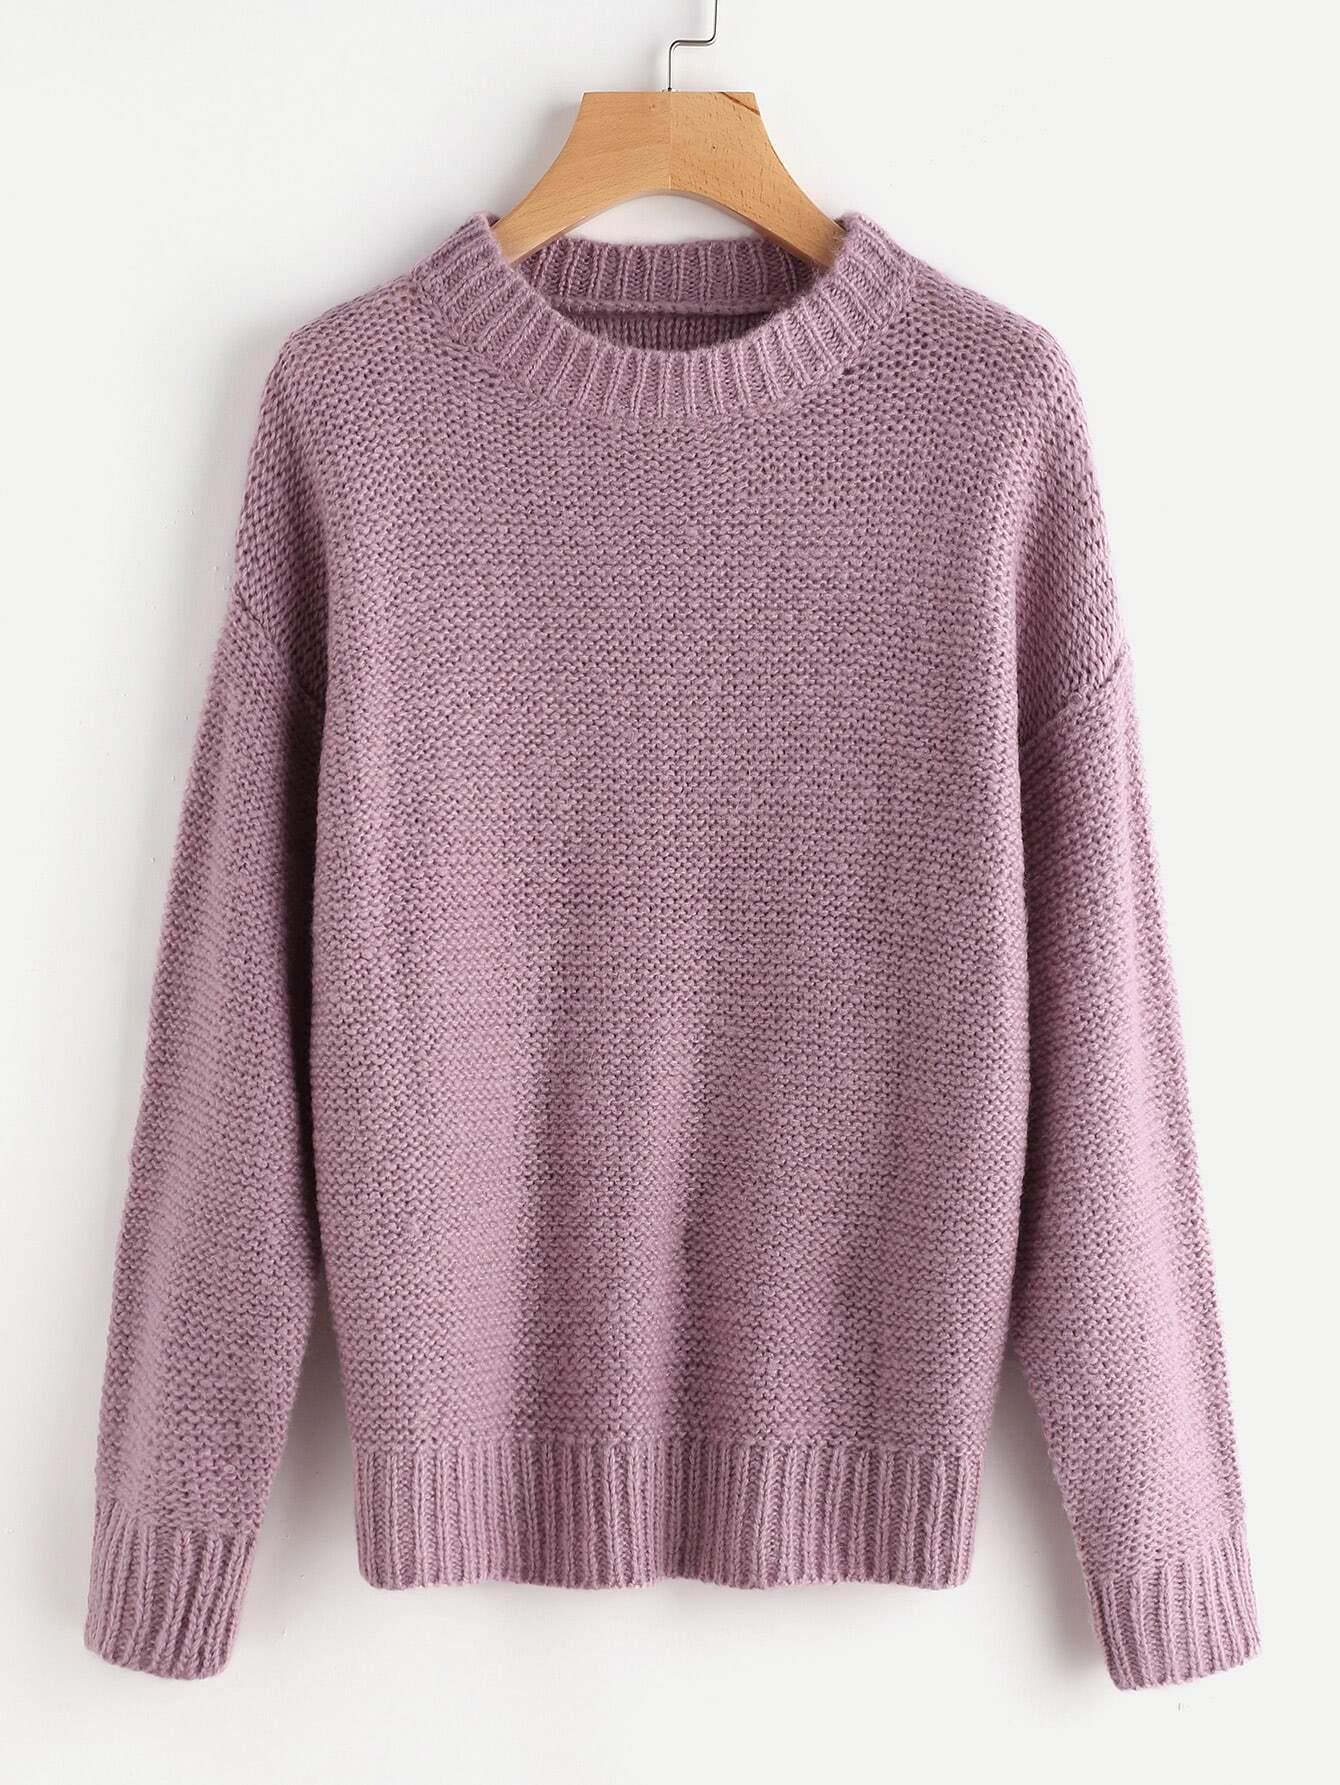 Rib Trim Drop Shoulder Jumper sweater170629457